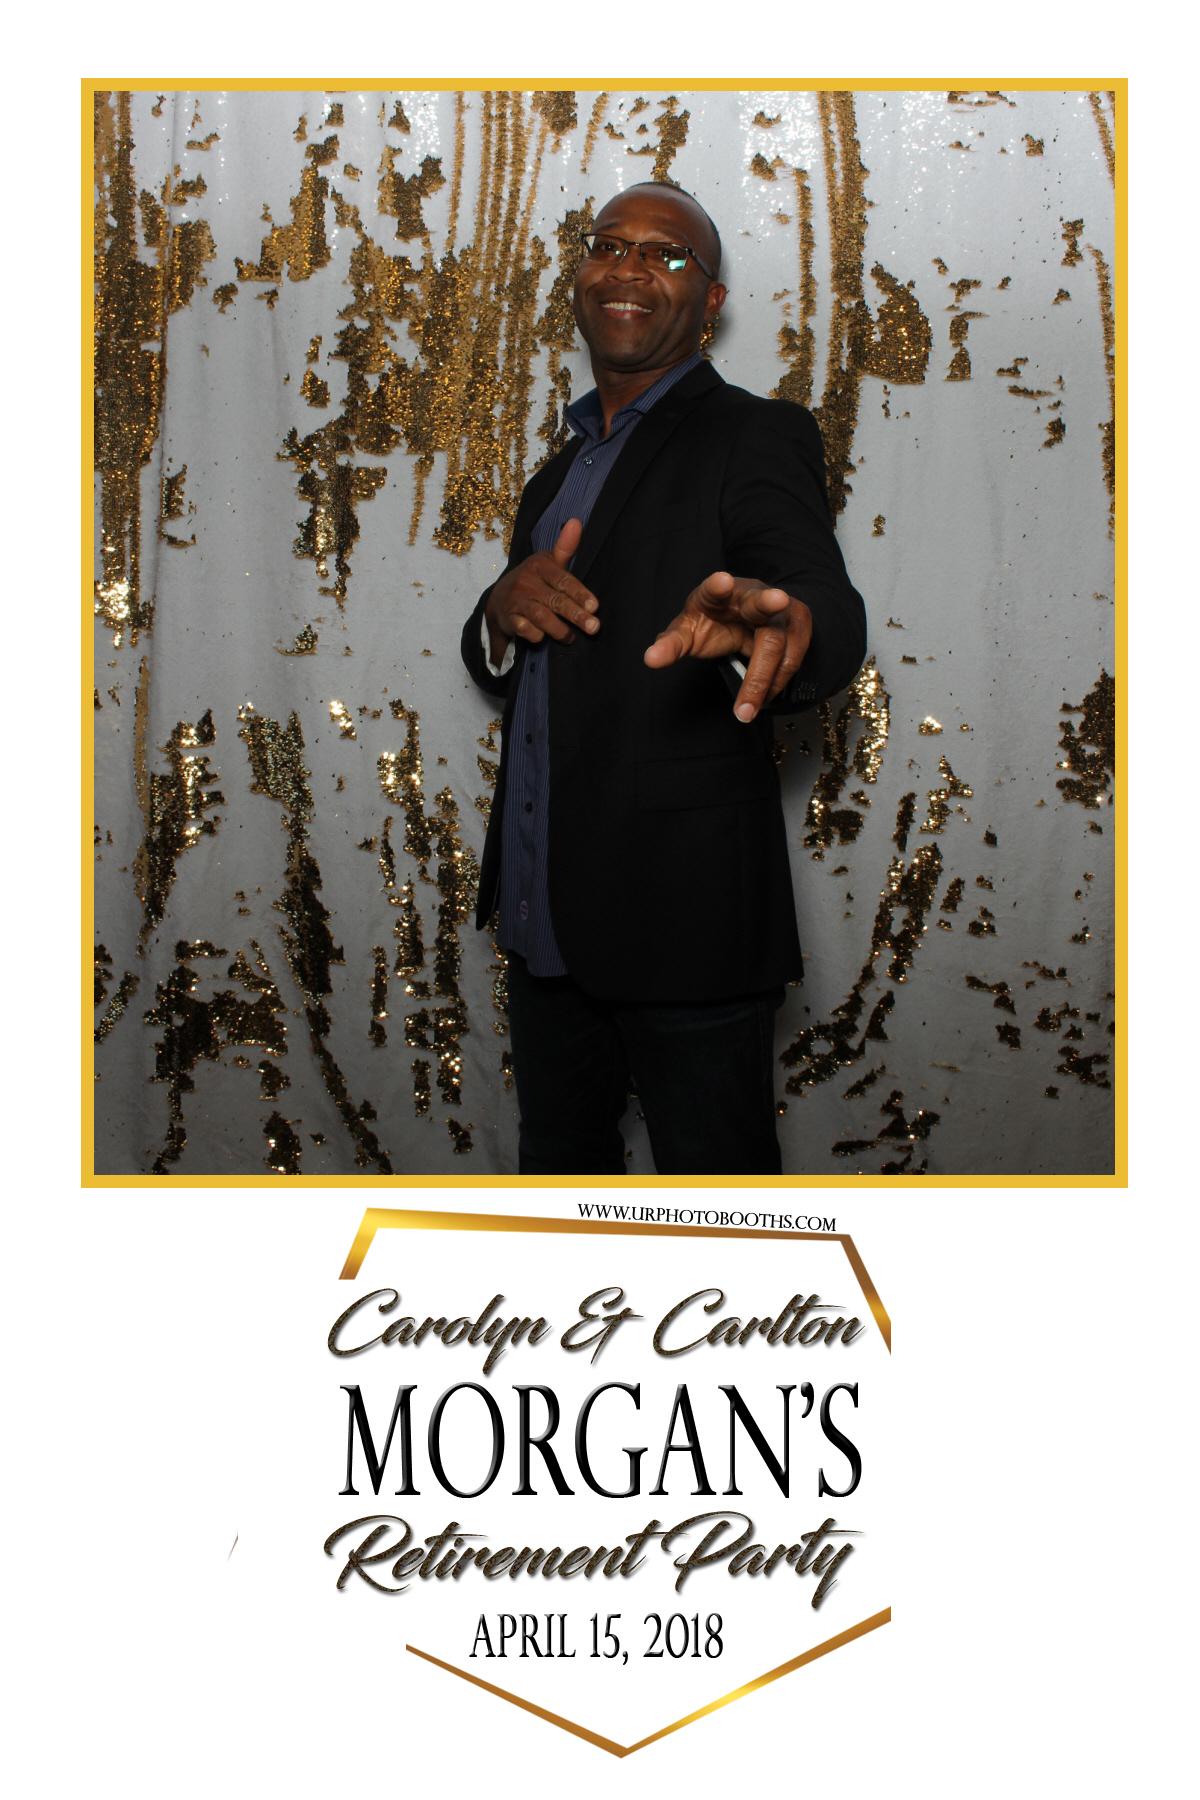 urpb3 | Morgan's Retirement Party